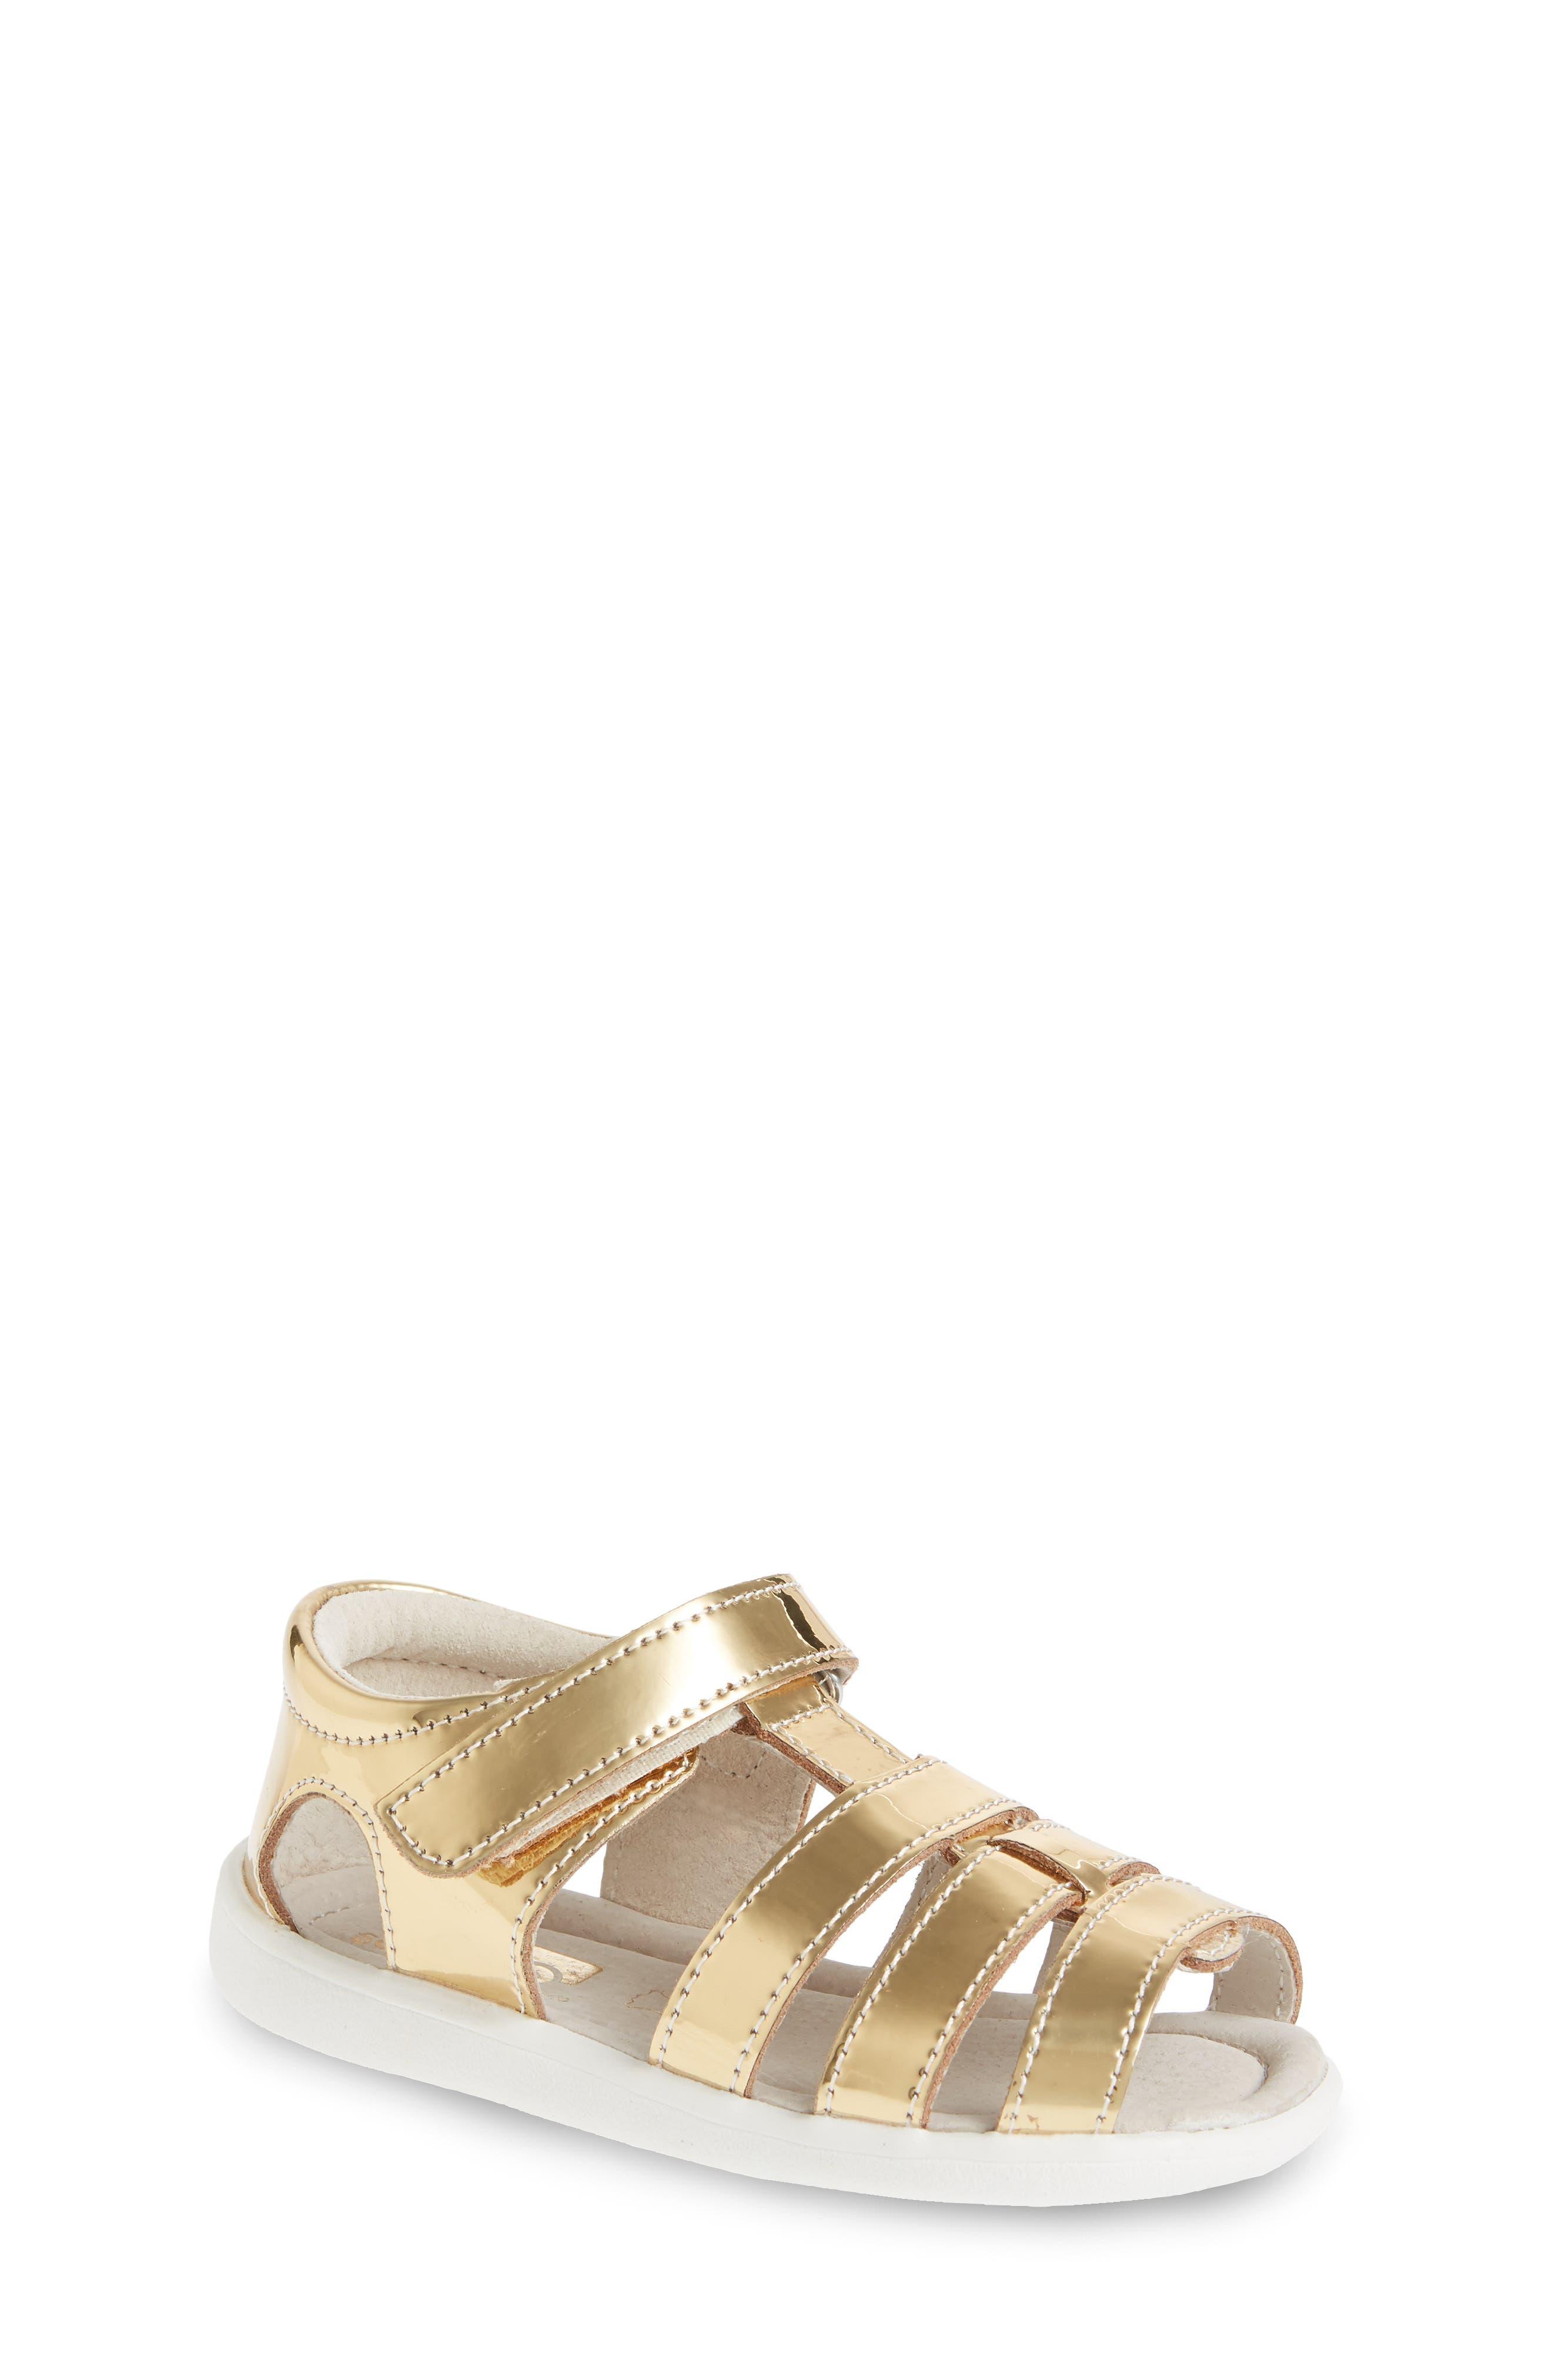 'Fe' Metallic Leather Gladiator Sandal,                             Main thumbnail 1, color,                             710